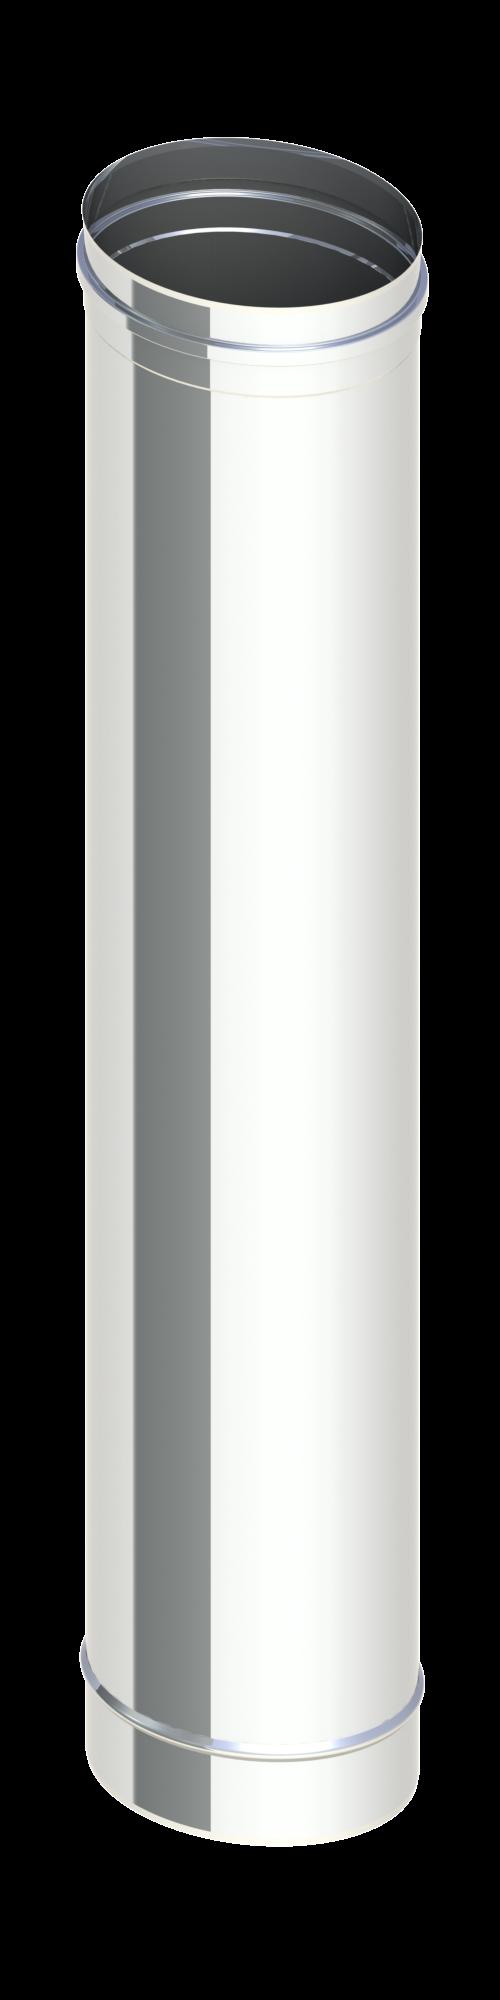 Ofenrohr oval 1 Mtr h =94 cm